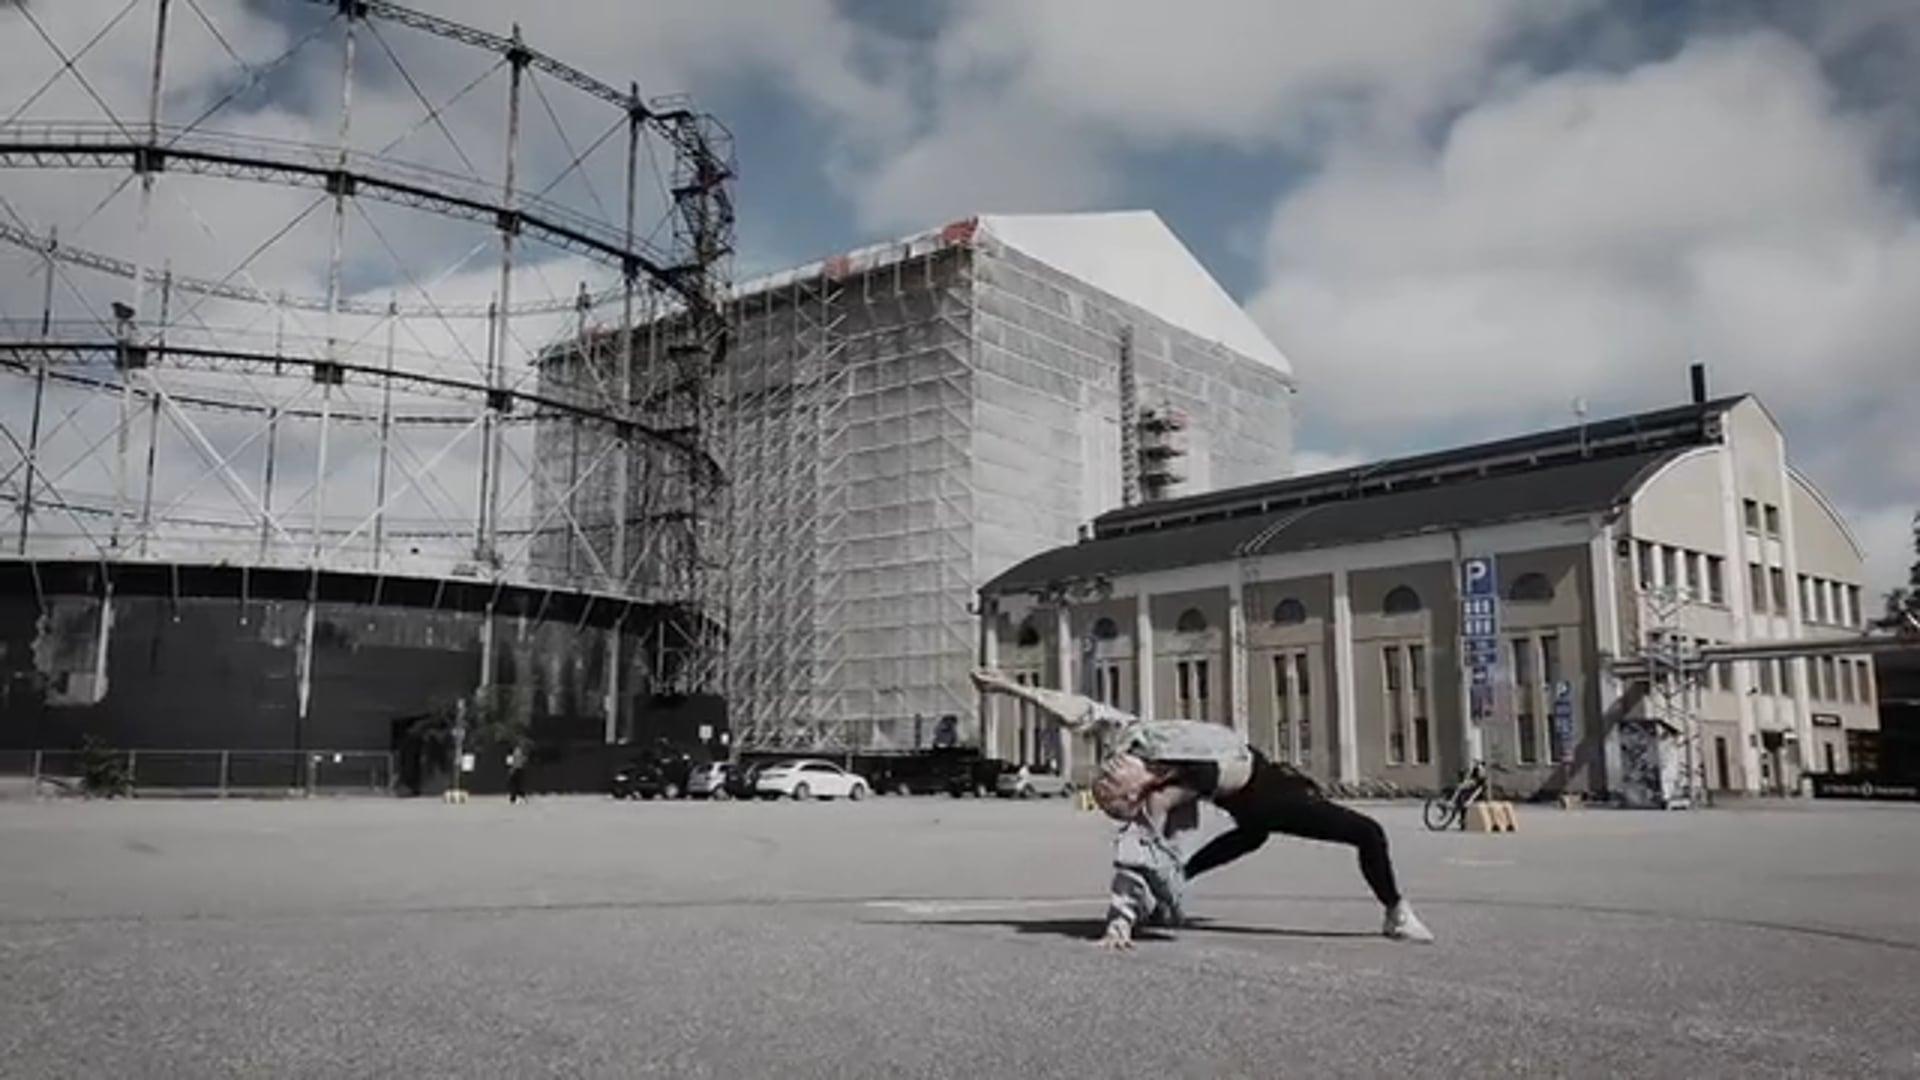 Forest Blakk - Breathe ll choreography by Noora Kaijanen